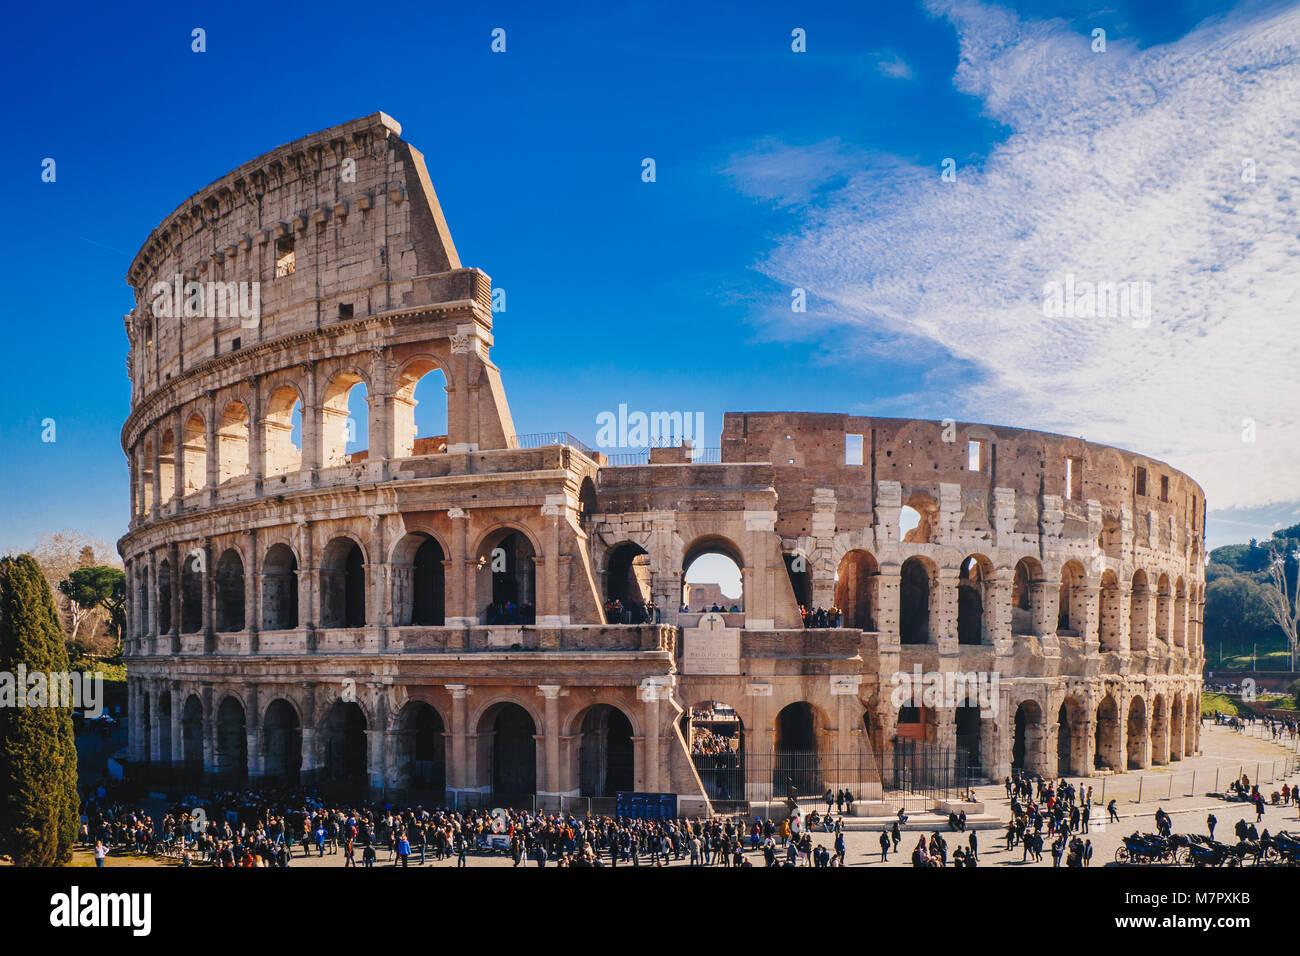 The Roman Colosseum in Rome - Stock Image